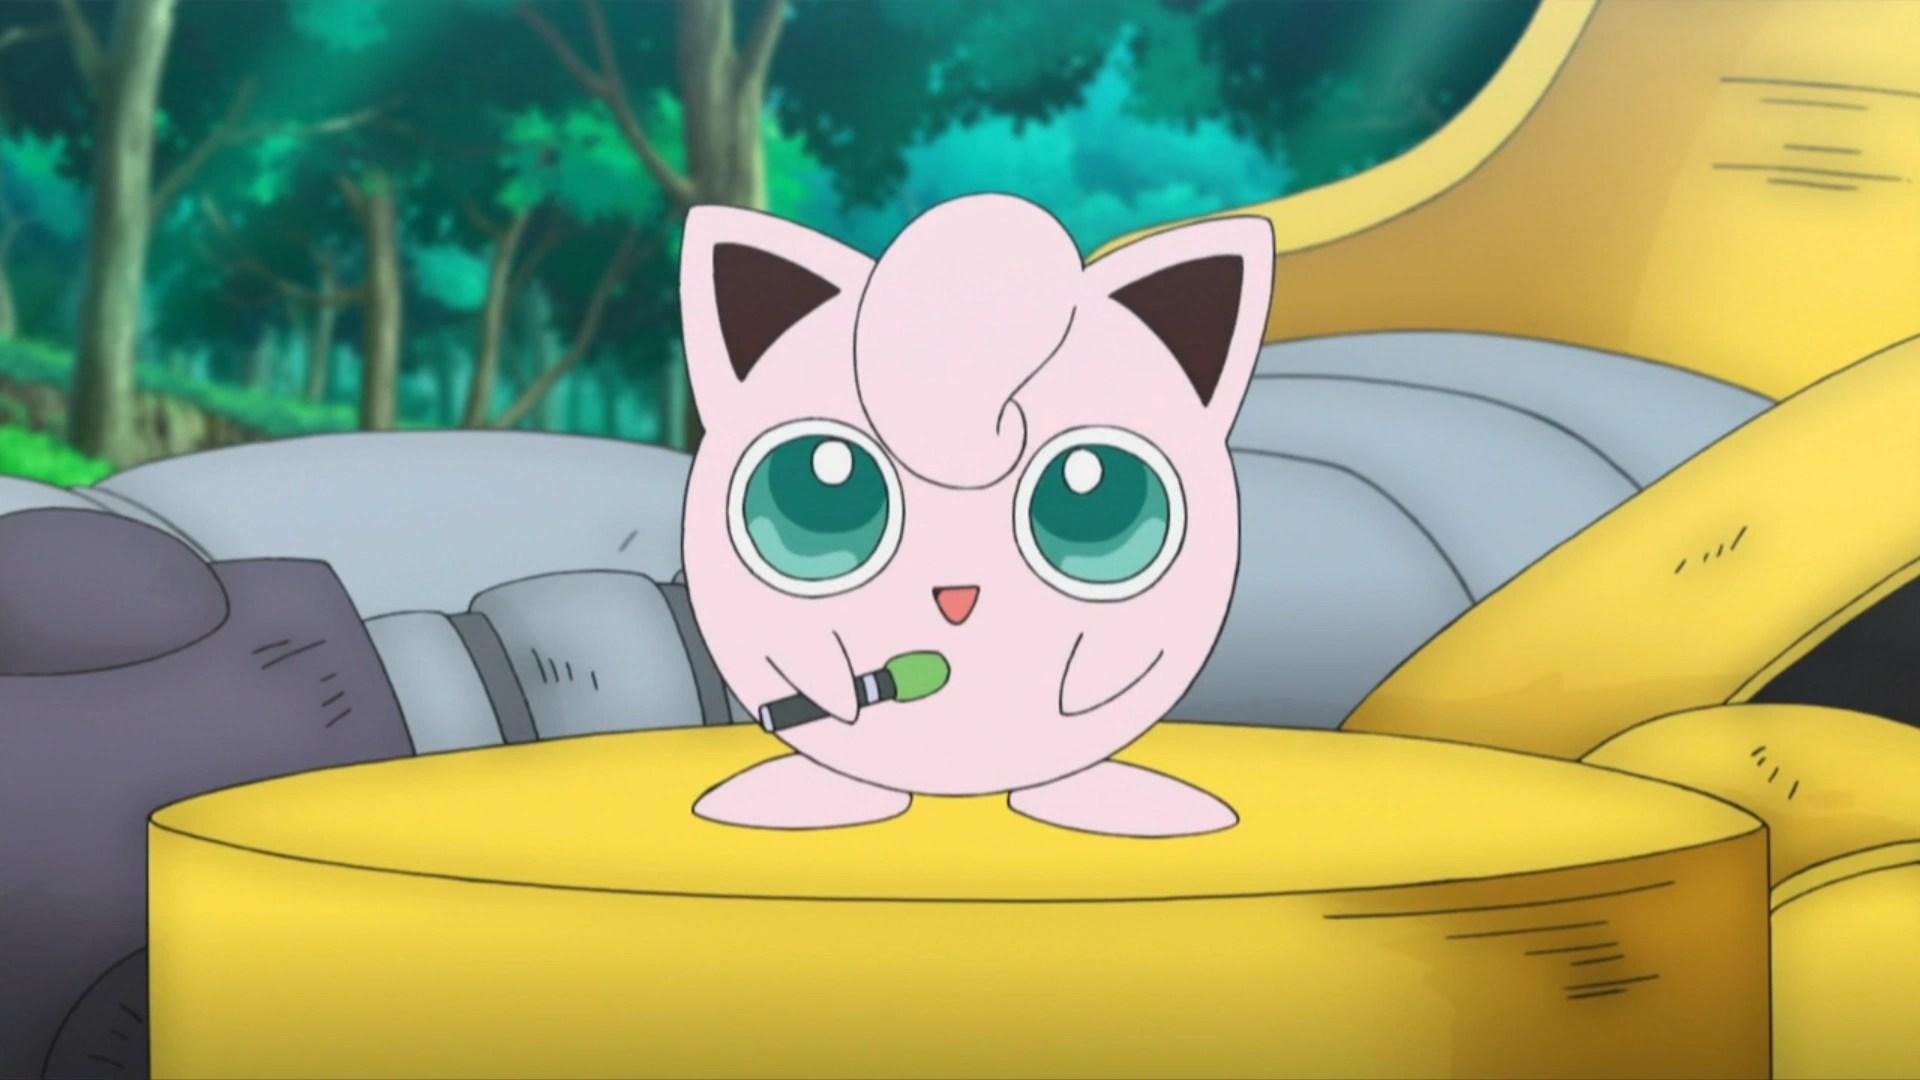 Cute Pikachu And Ash Wallpaper Jigglypuff Anime Pok 233 Mon Wiki Fandom Powered By Wikia